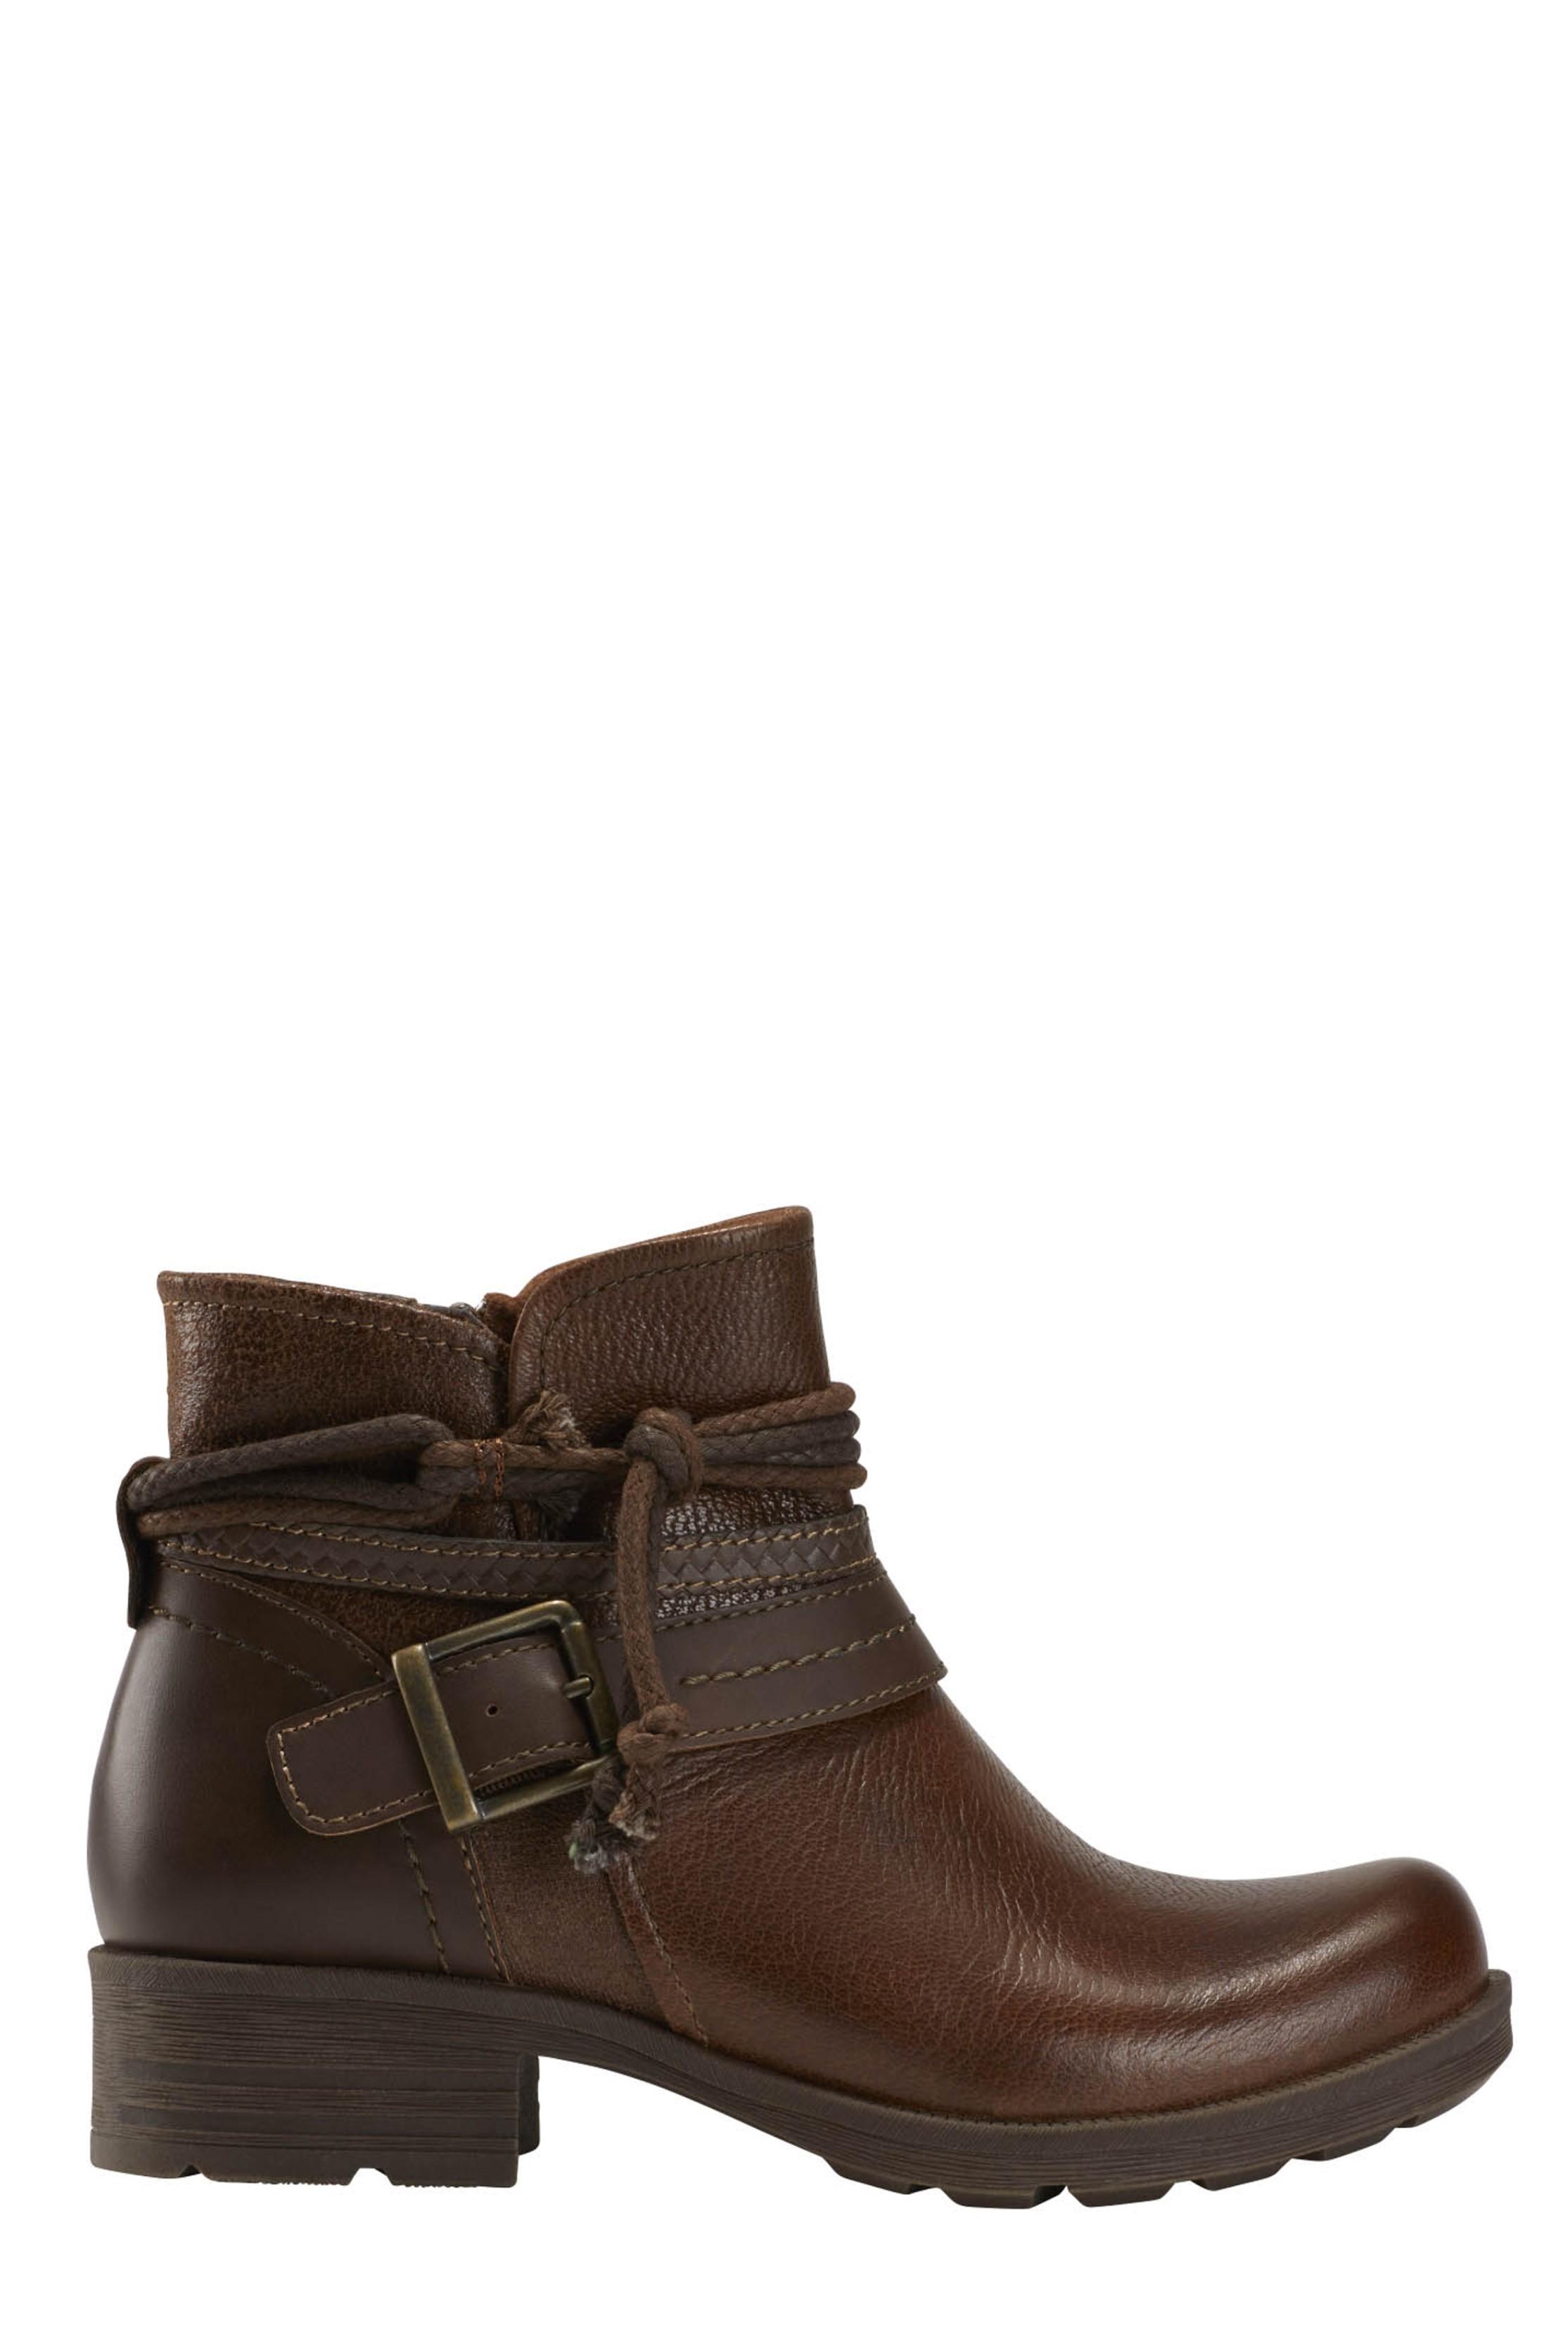 EARTH Brown Randi Radley Boot